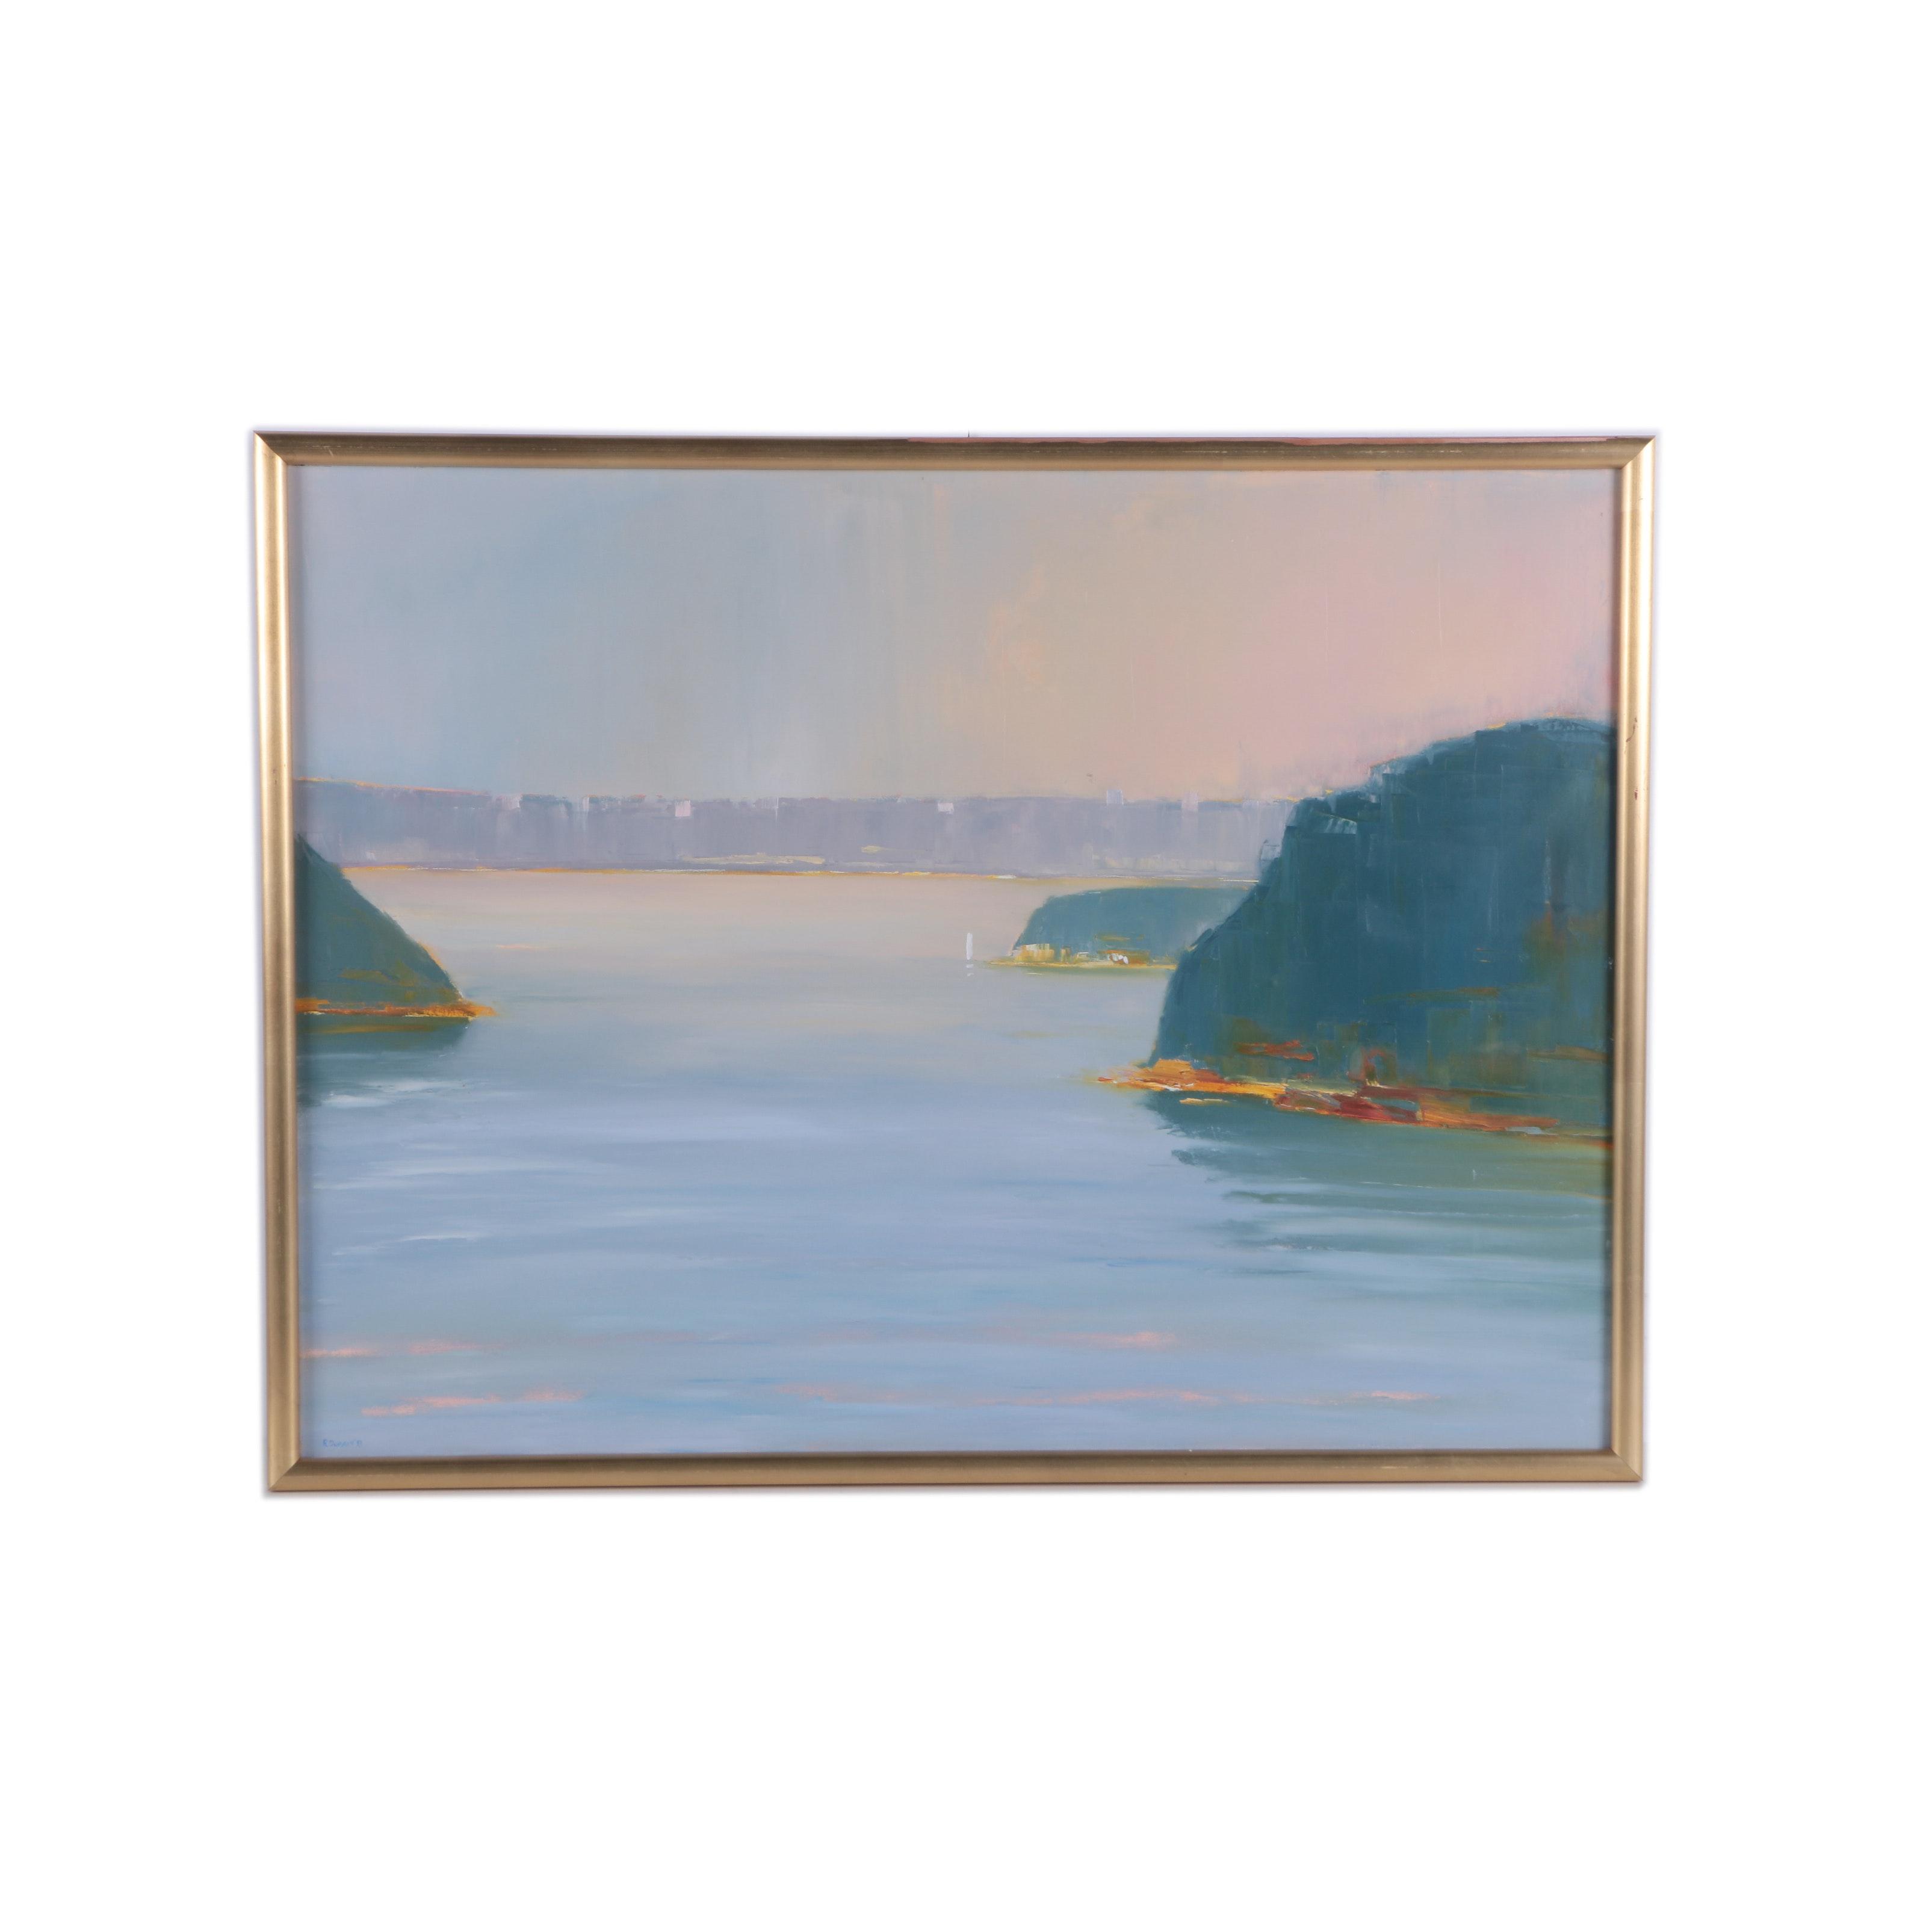 R. Dupain Oil Painting on Canvas Landscape of a Shore